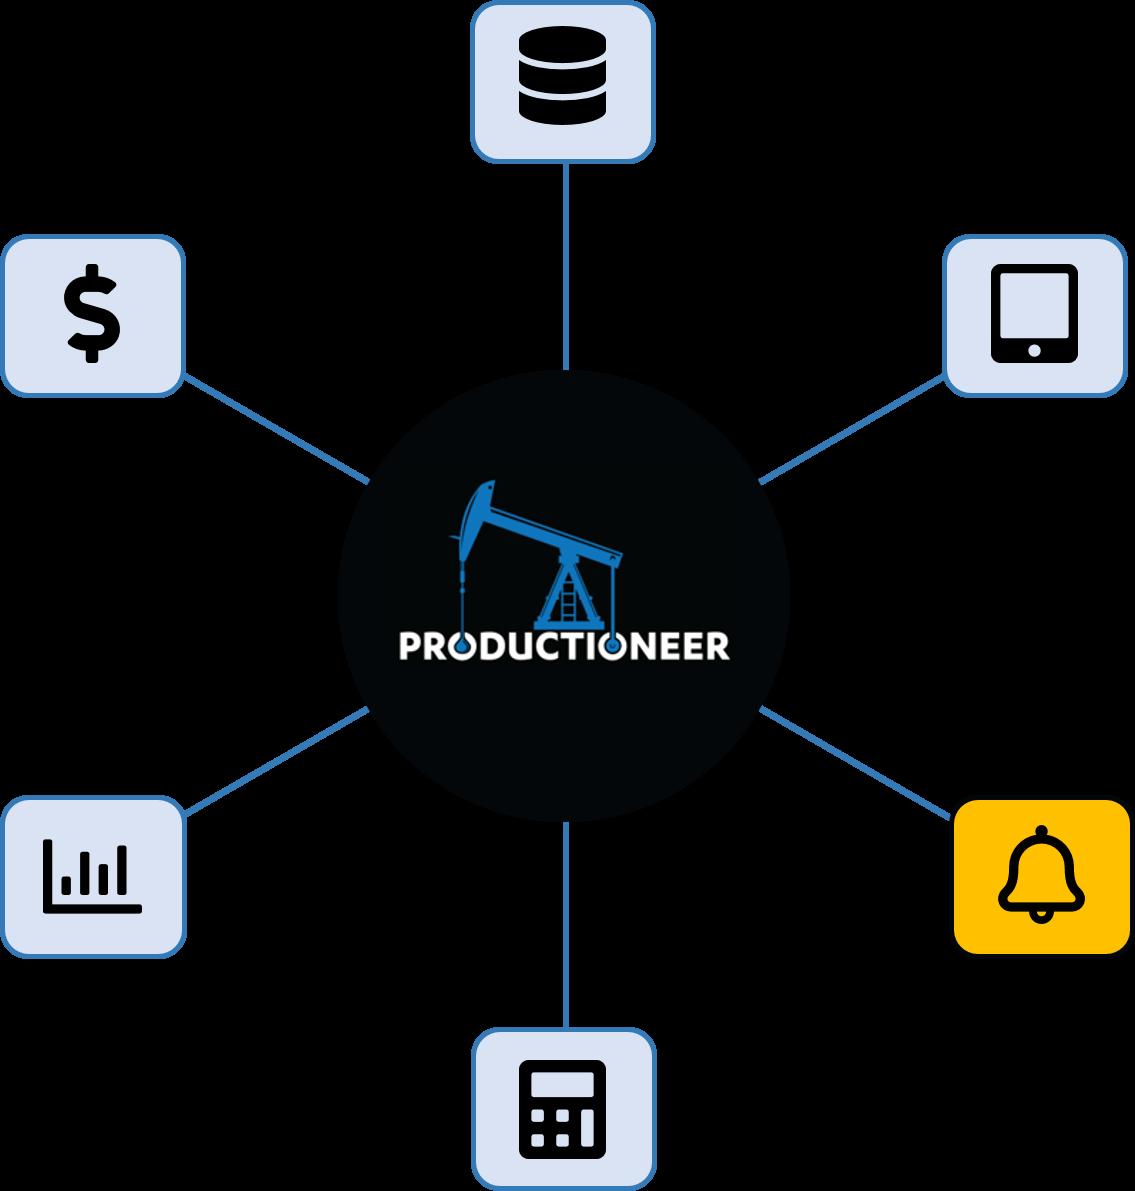 Productioneer concierge level service feature wheel